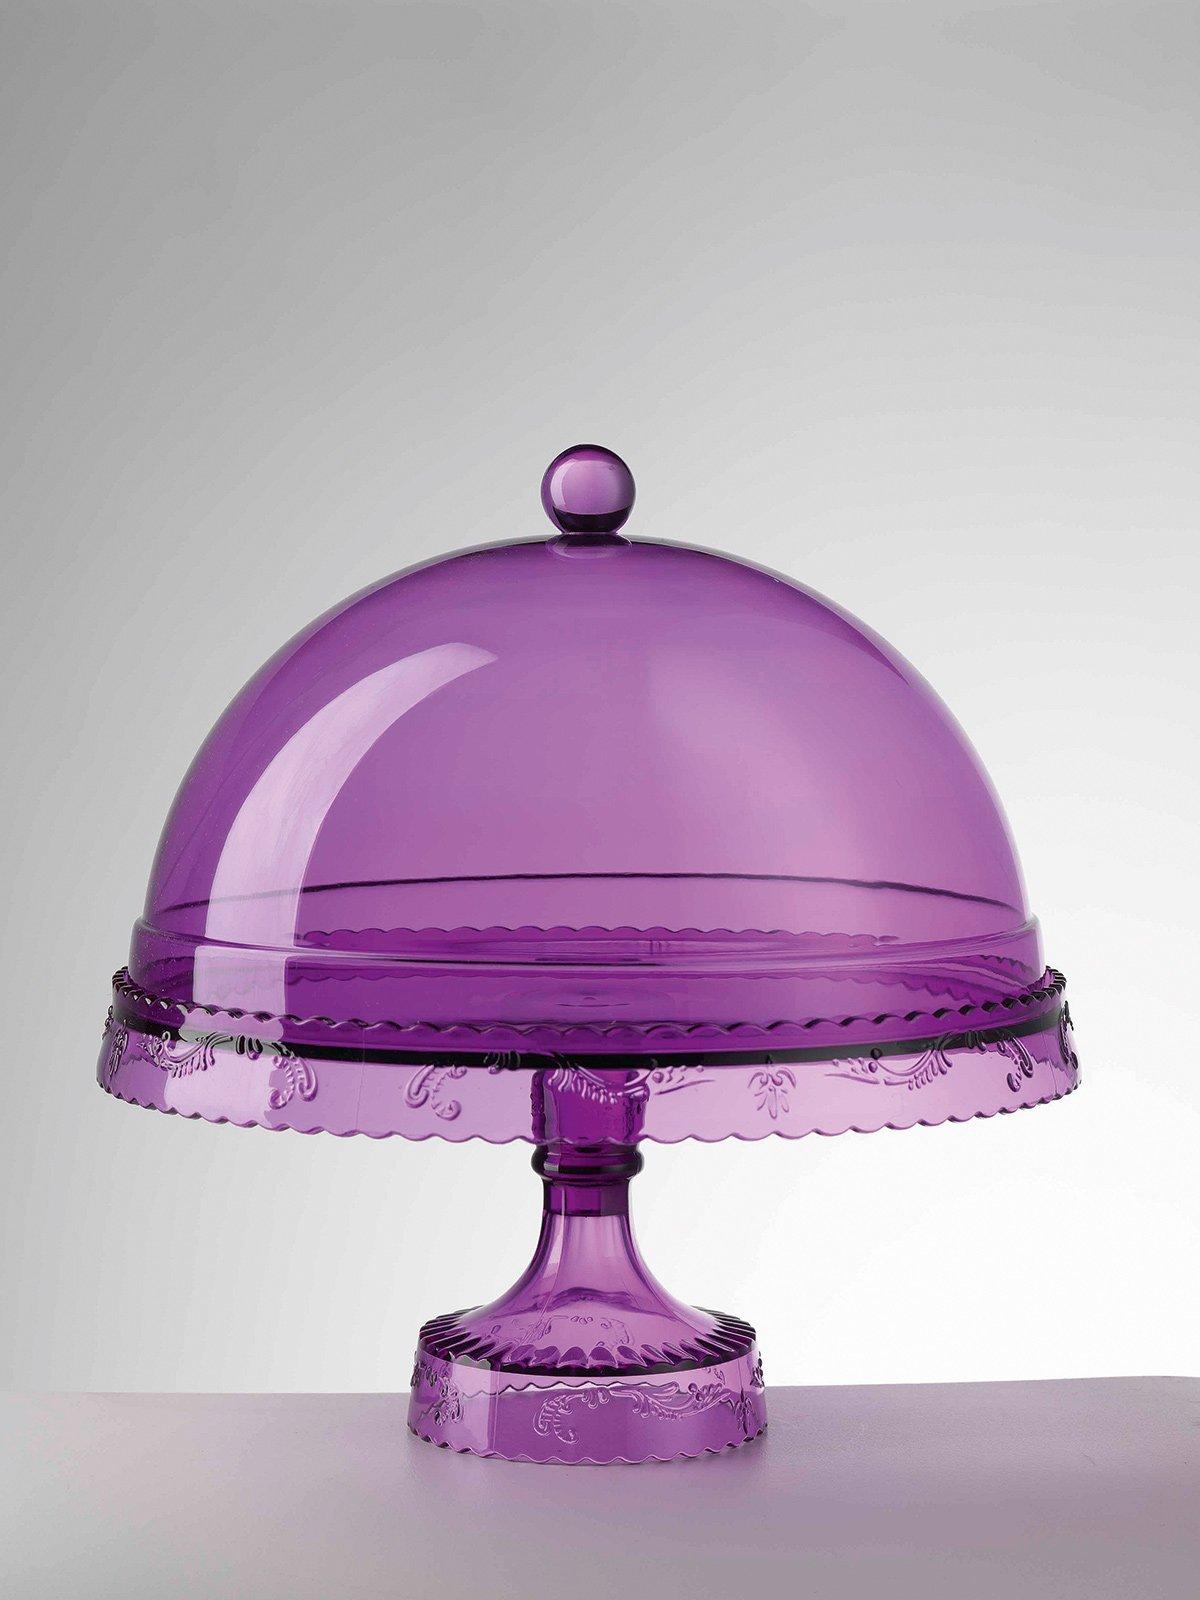 In cucina per torte e dolci cose di casa - Oggettistica per la casa moderna ...